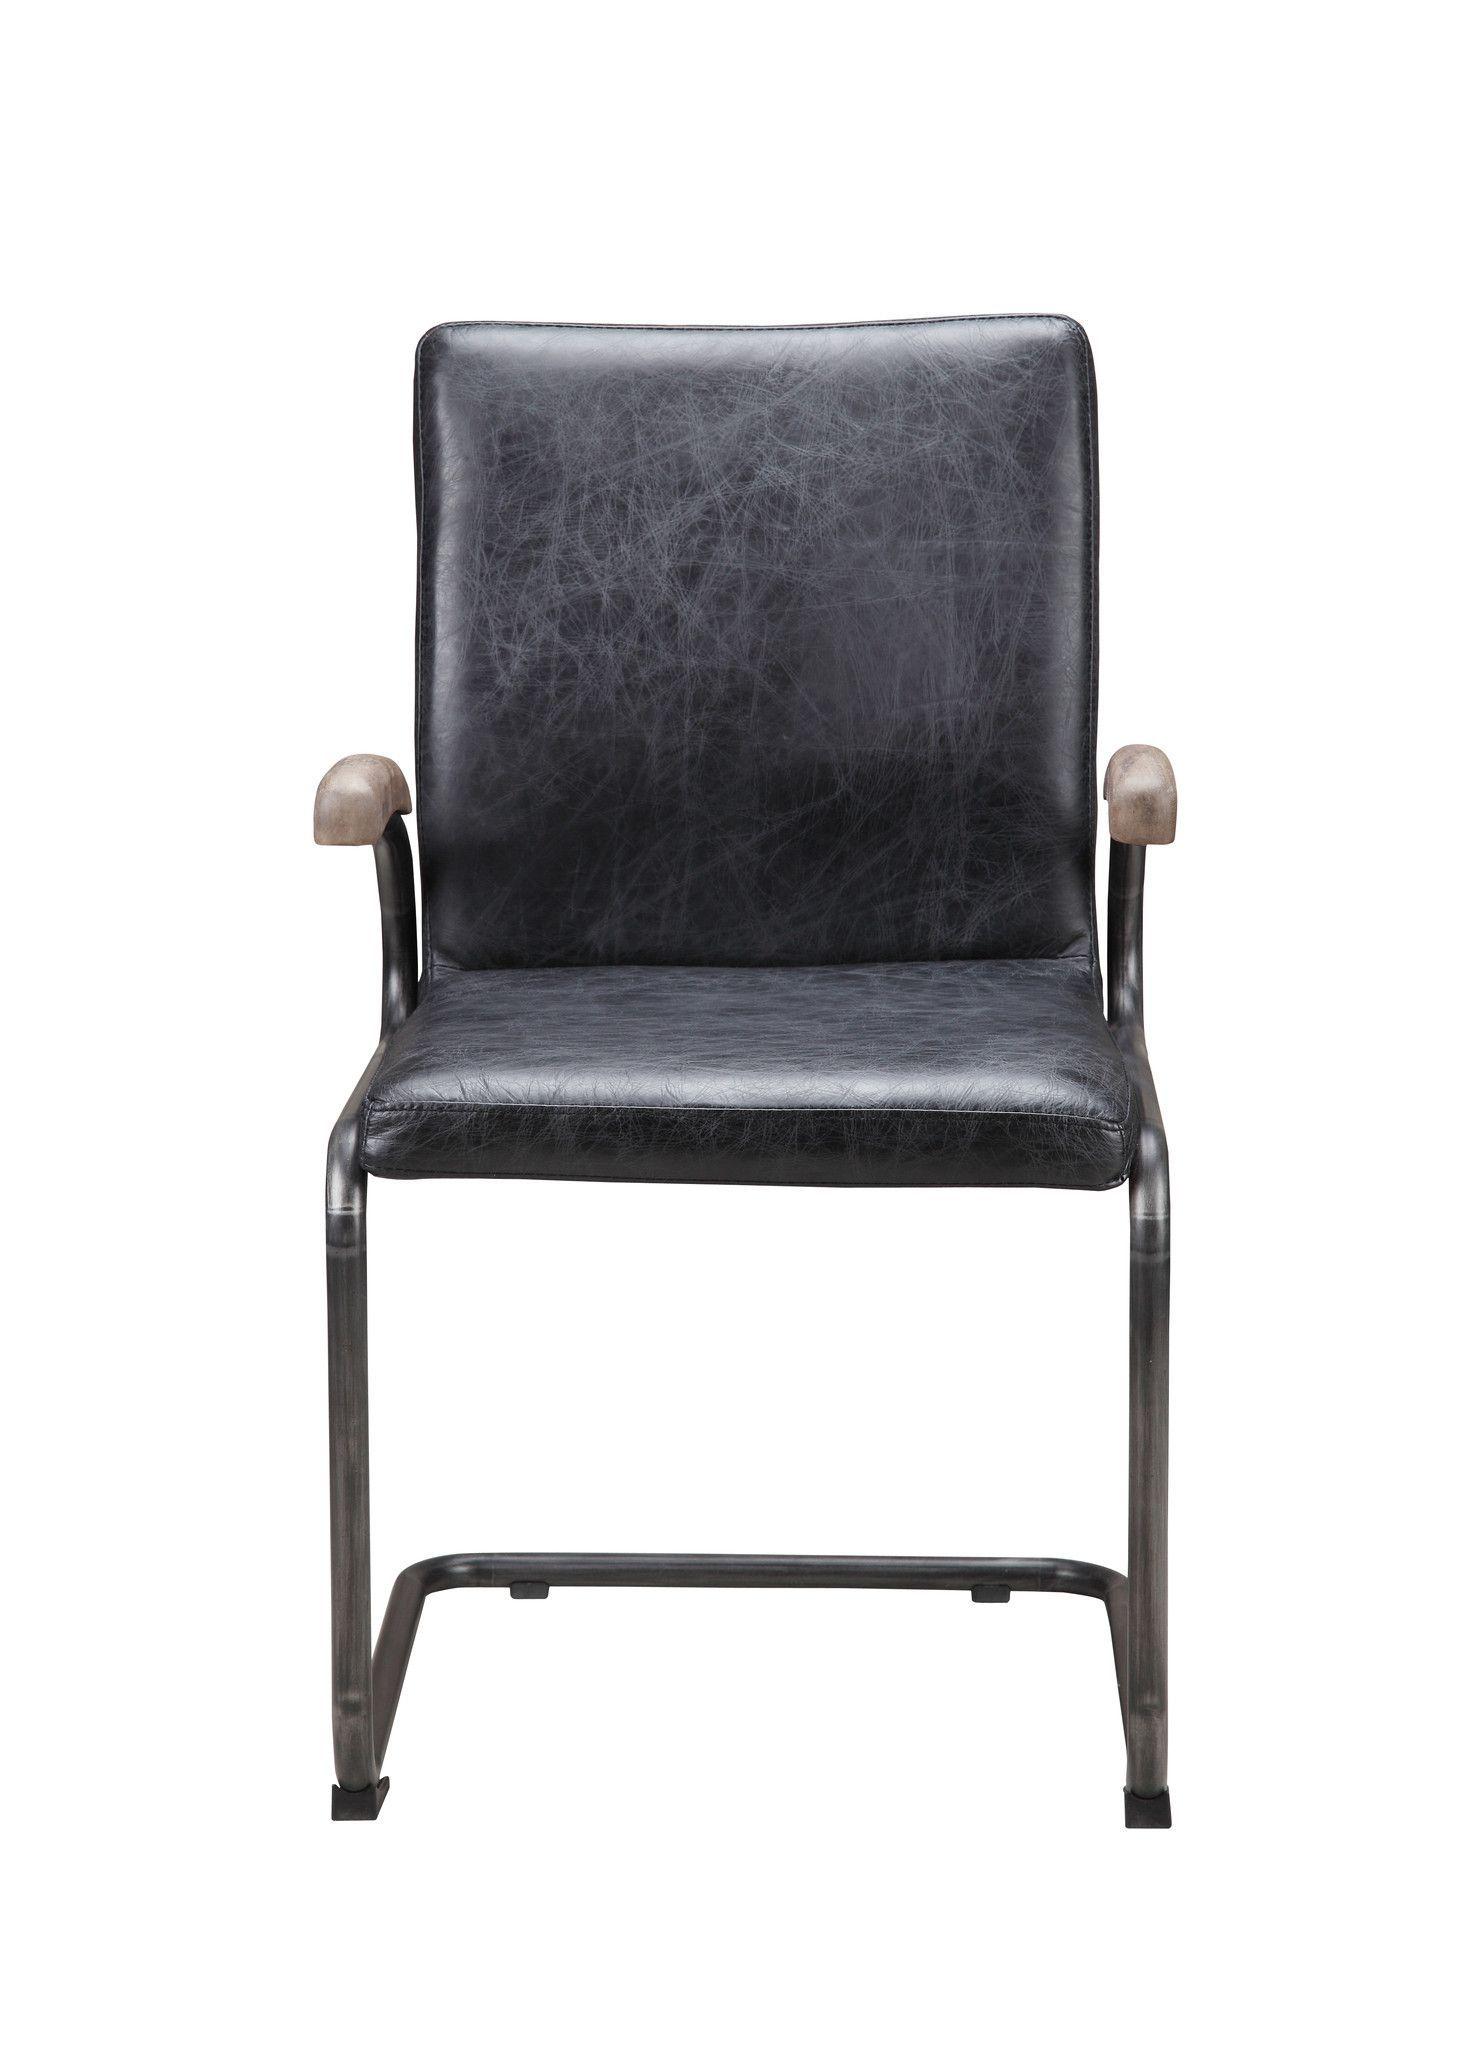 Perth Arm Chair Antique Black (Set Of 2) Top Grain Leather Iron Frame - Perth Arm Chair Antique Black (Set Of 2) Top Grain Leather Iron